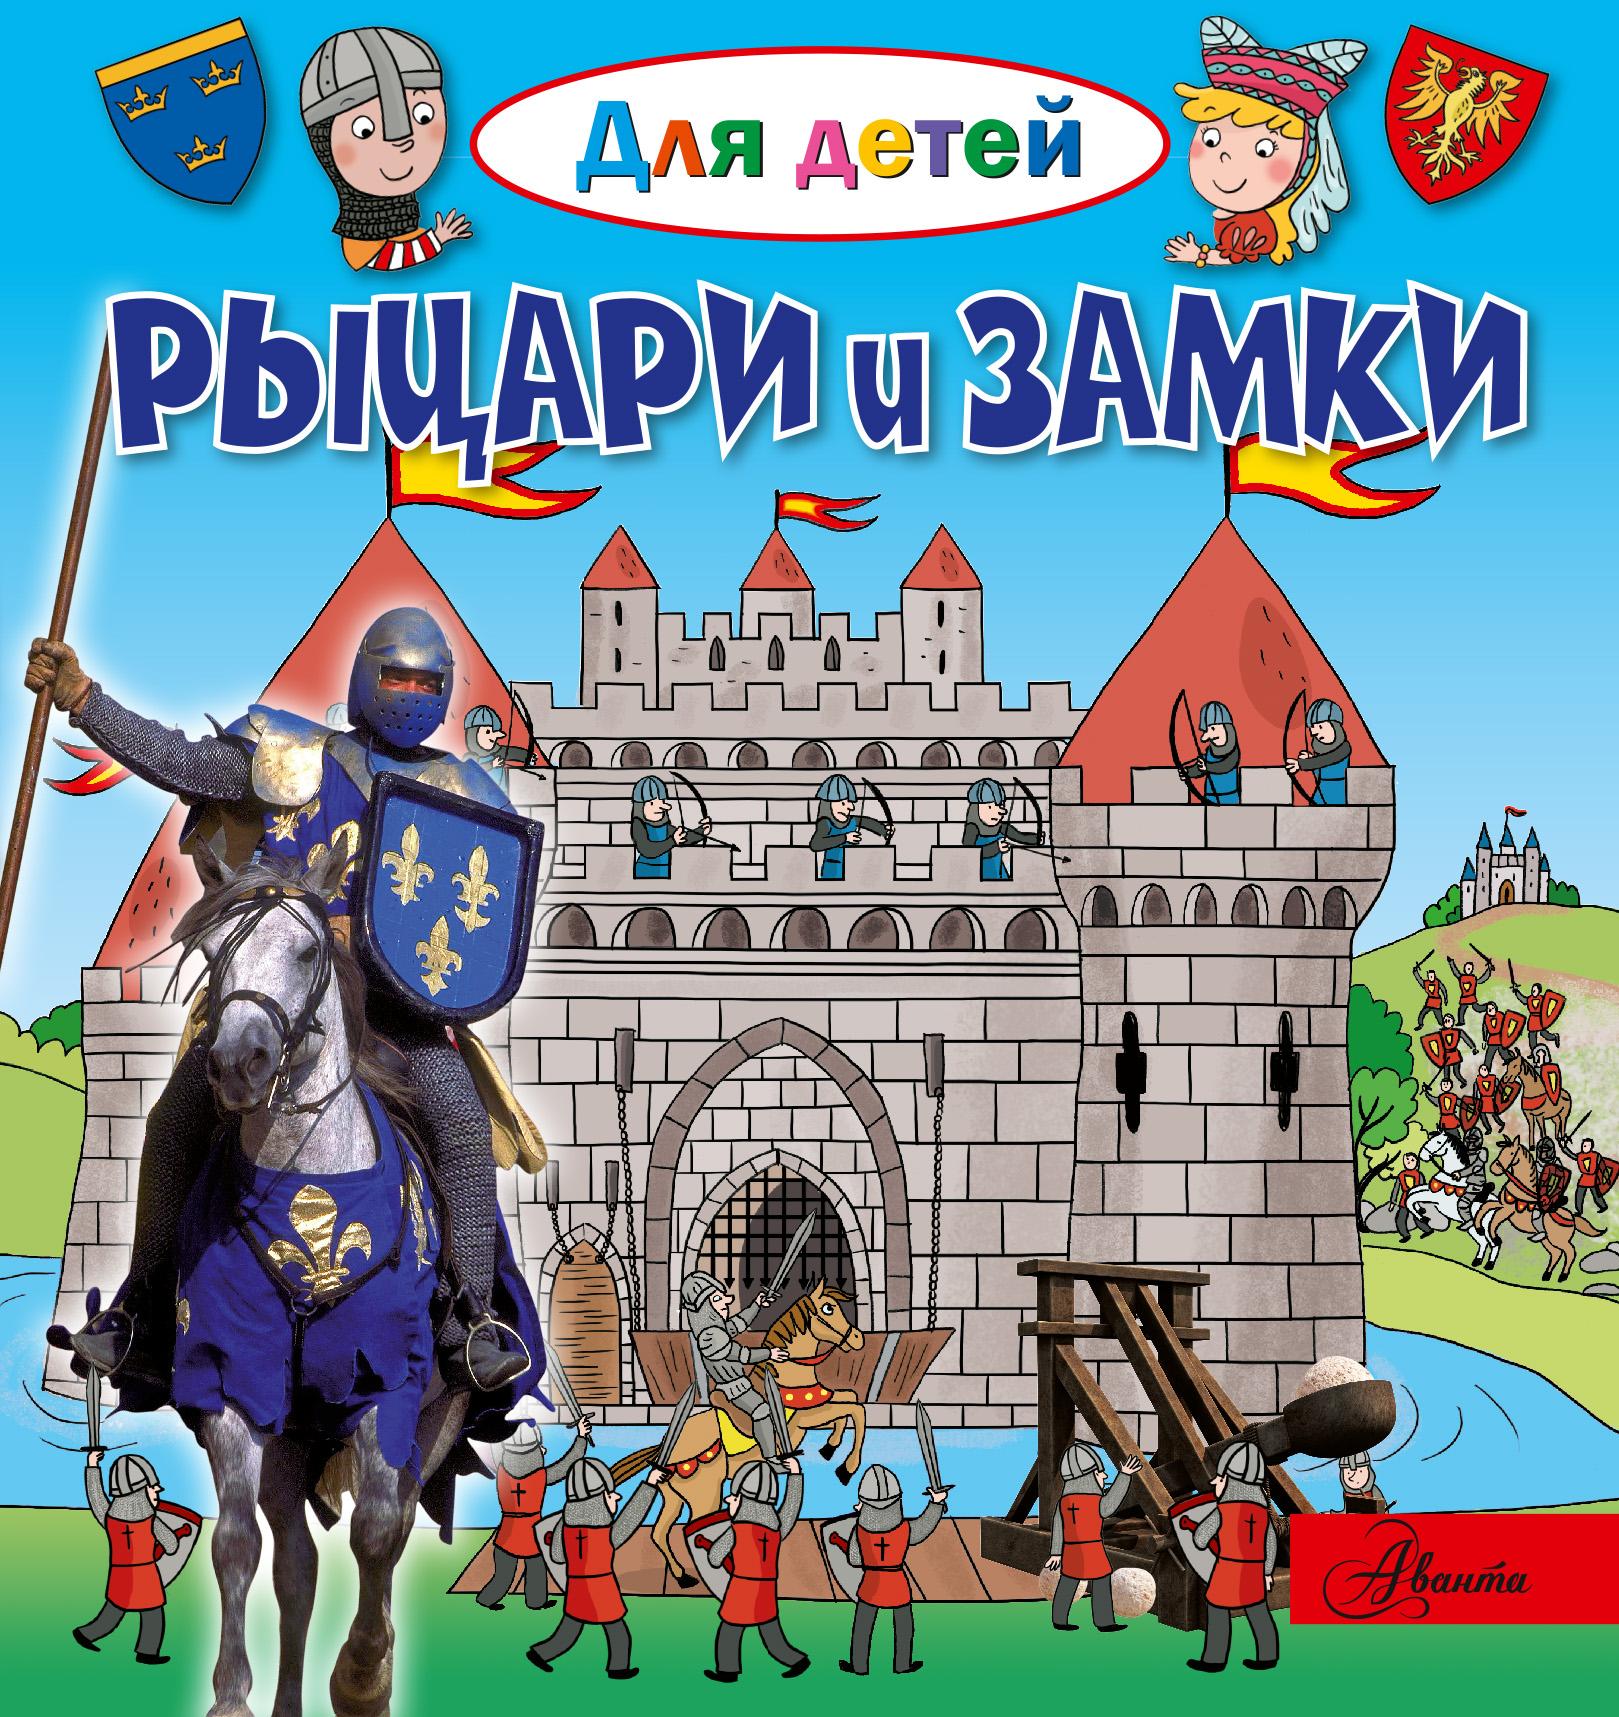 Эммануэль Лепти Рыцари и замки филип стил рыцари и замки